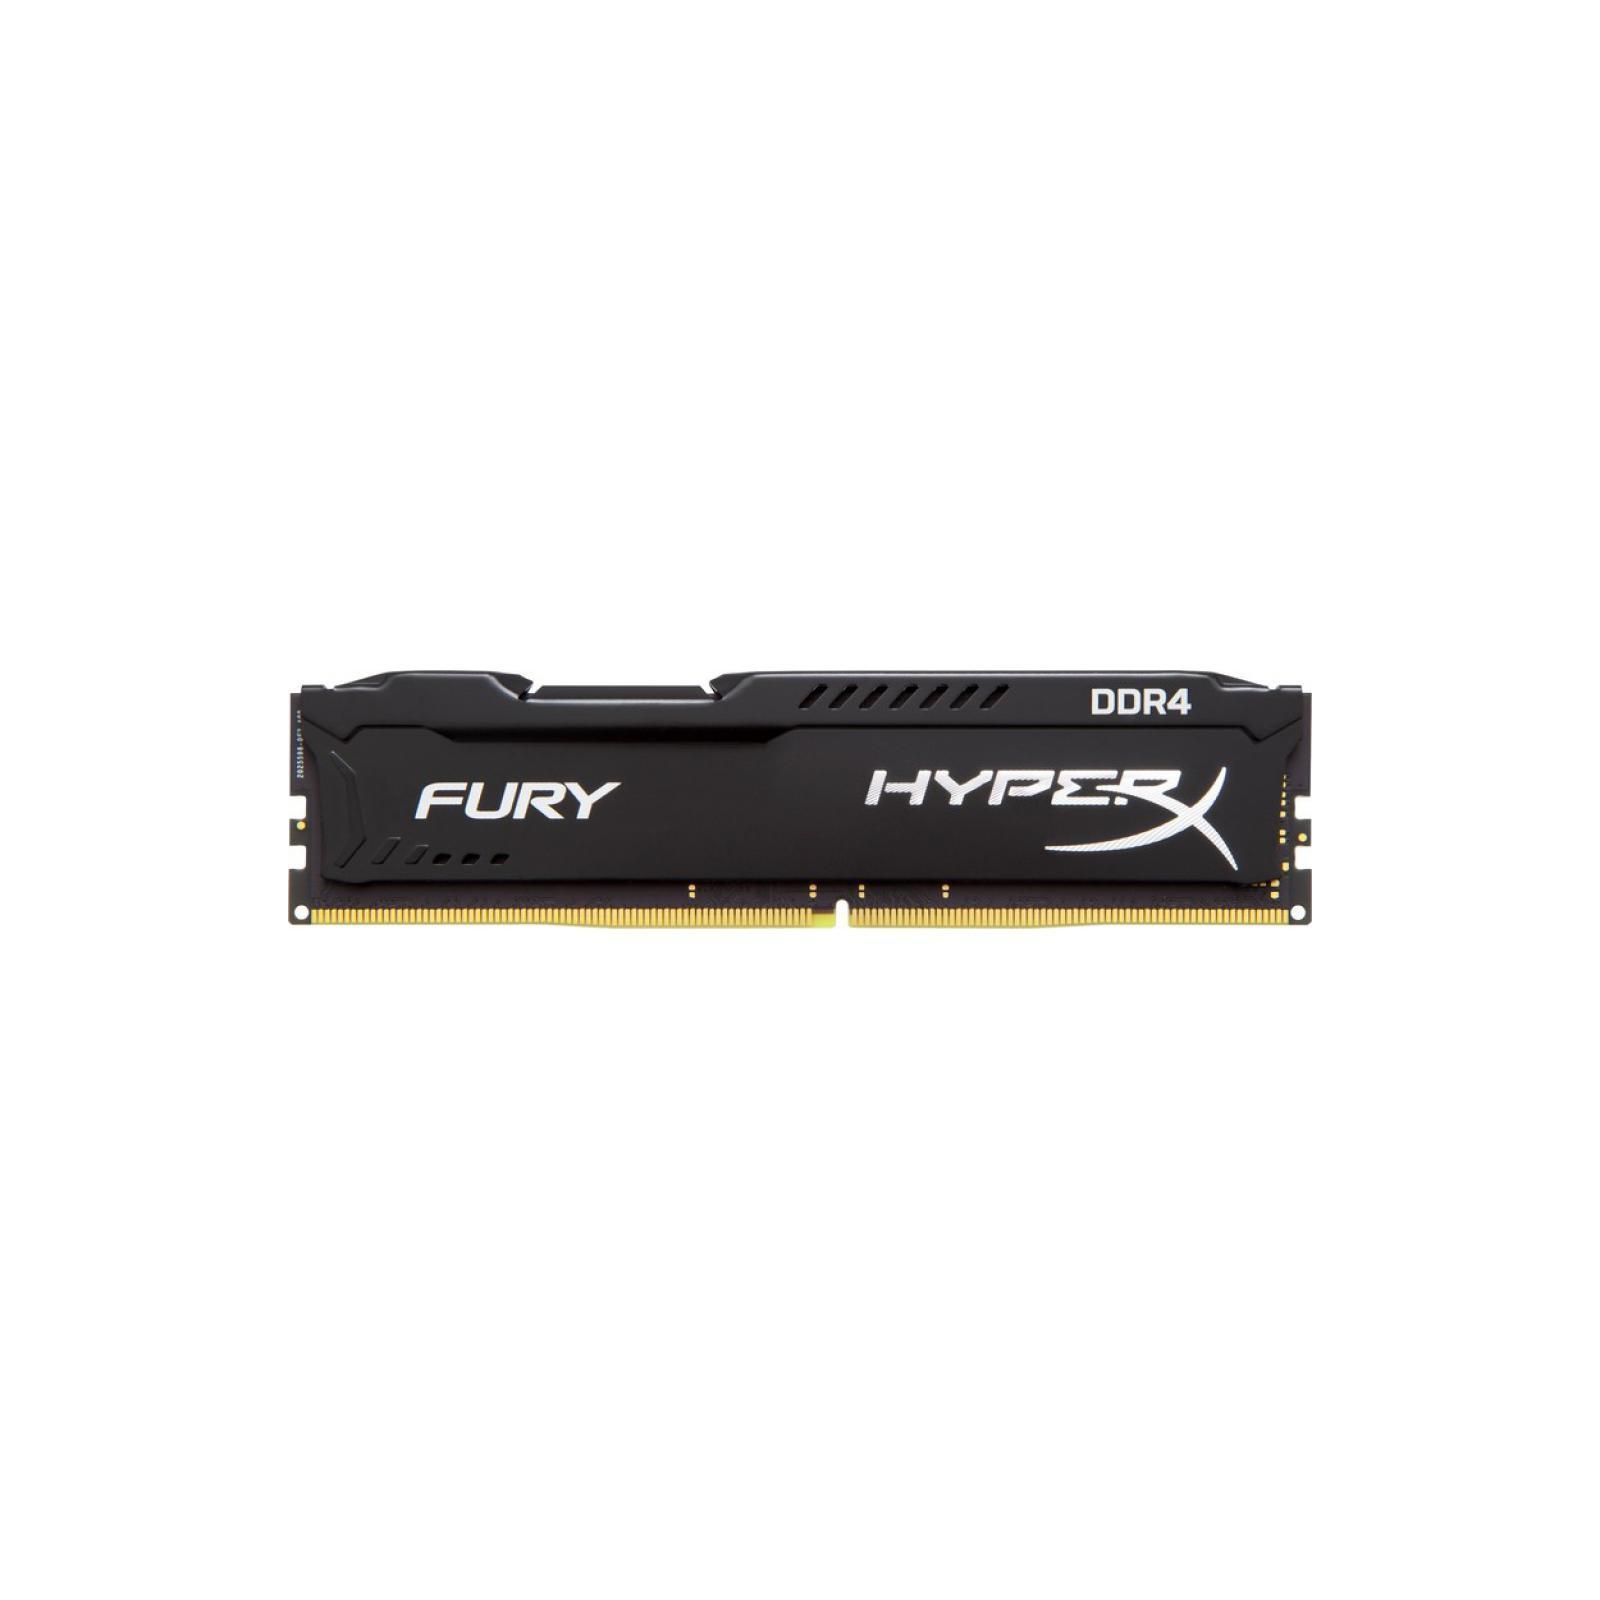 Модуль памяти для компьютера DDR4 8GB 2933 MHz HyperX FURY Black HyperX (Kingston Fury) (HX429C17FB2/8)